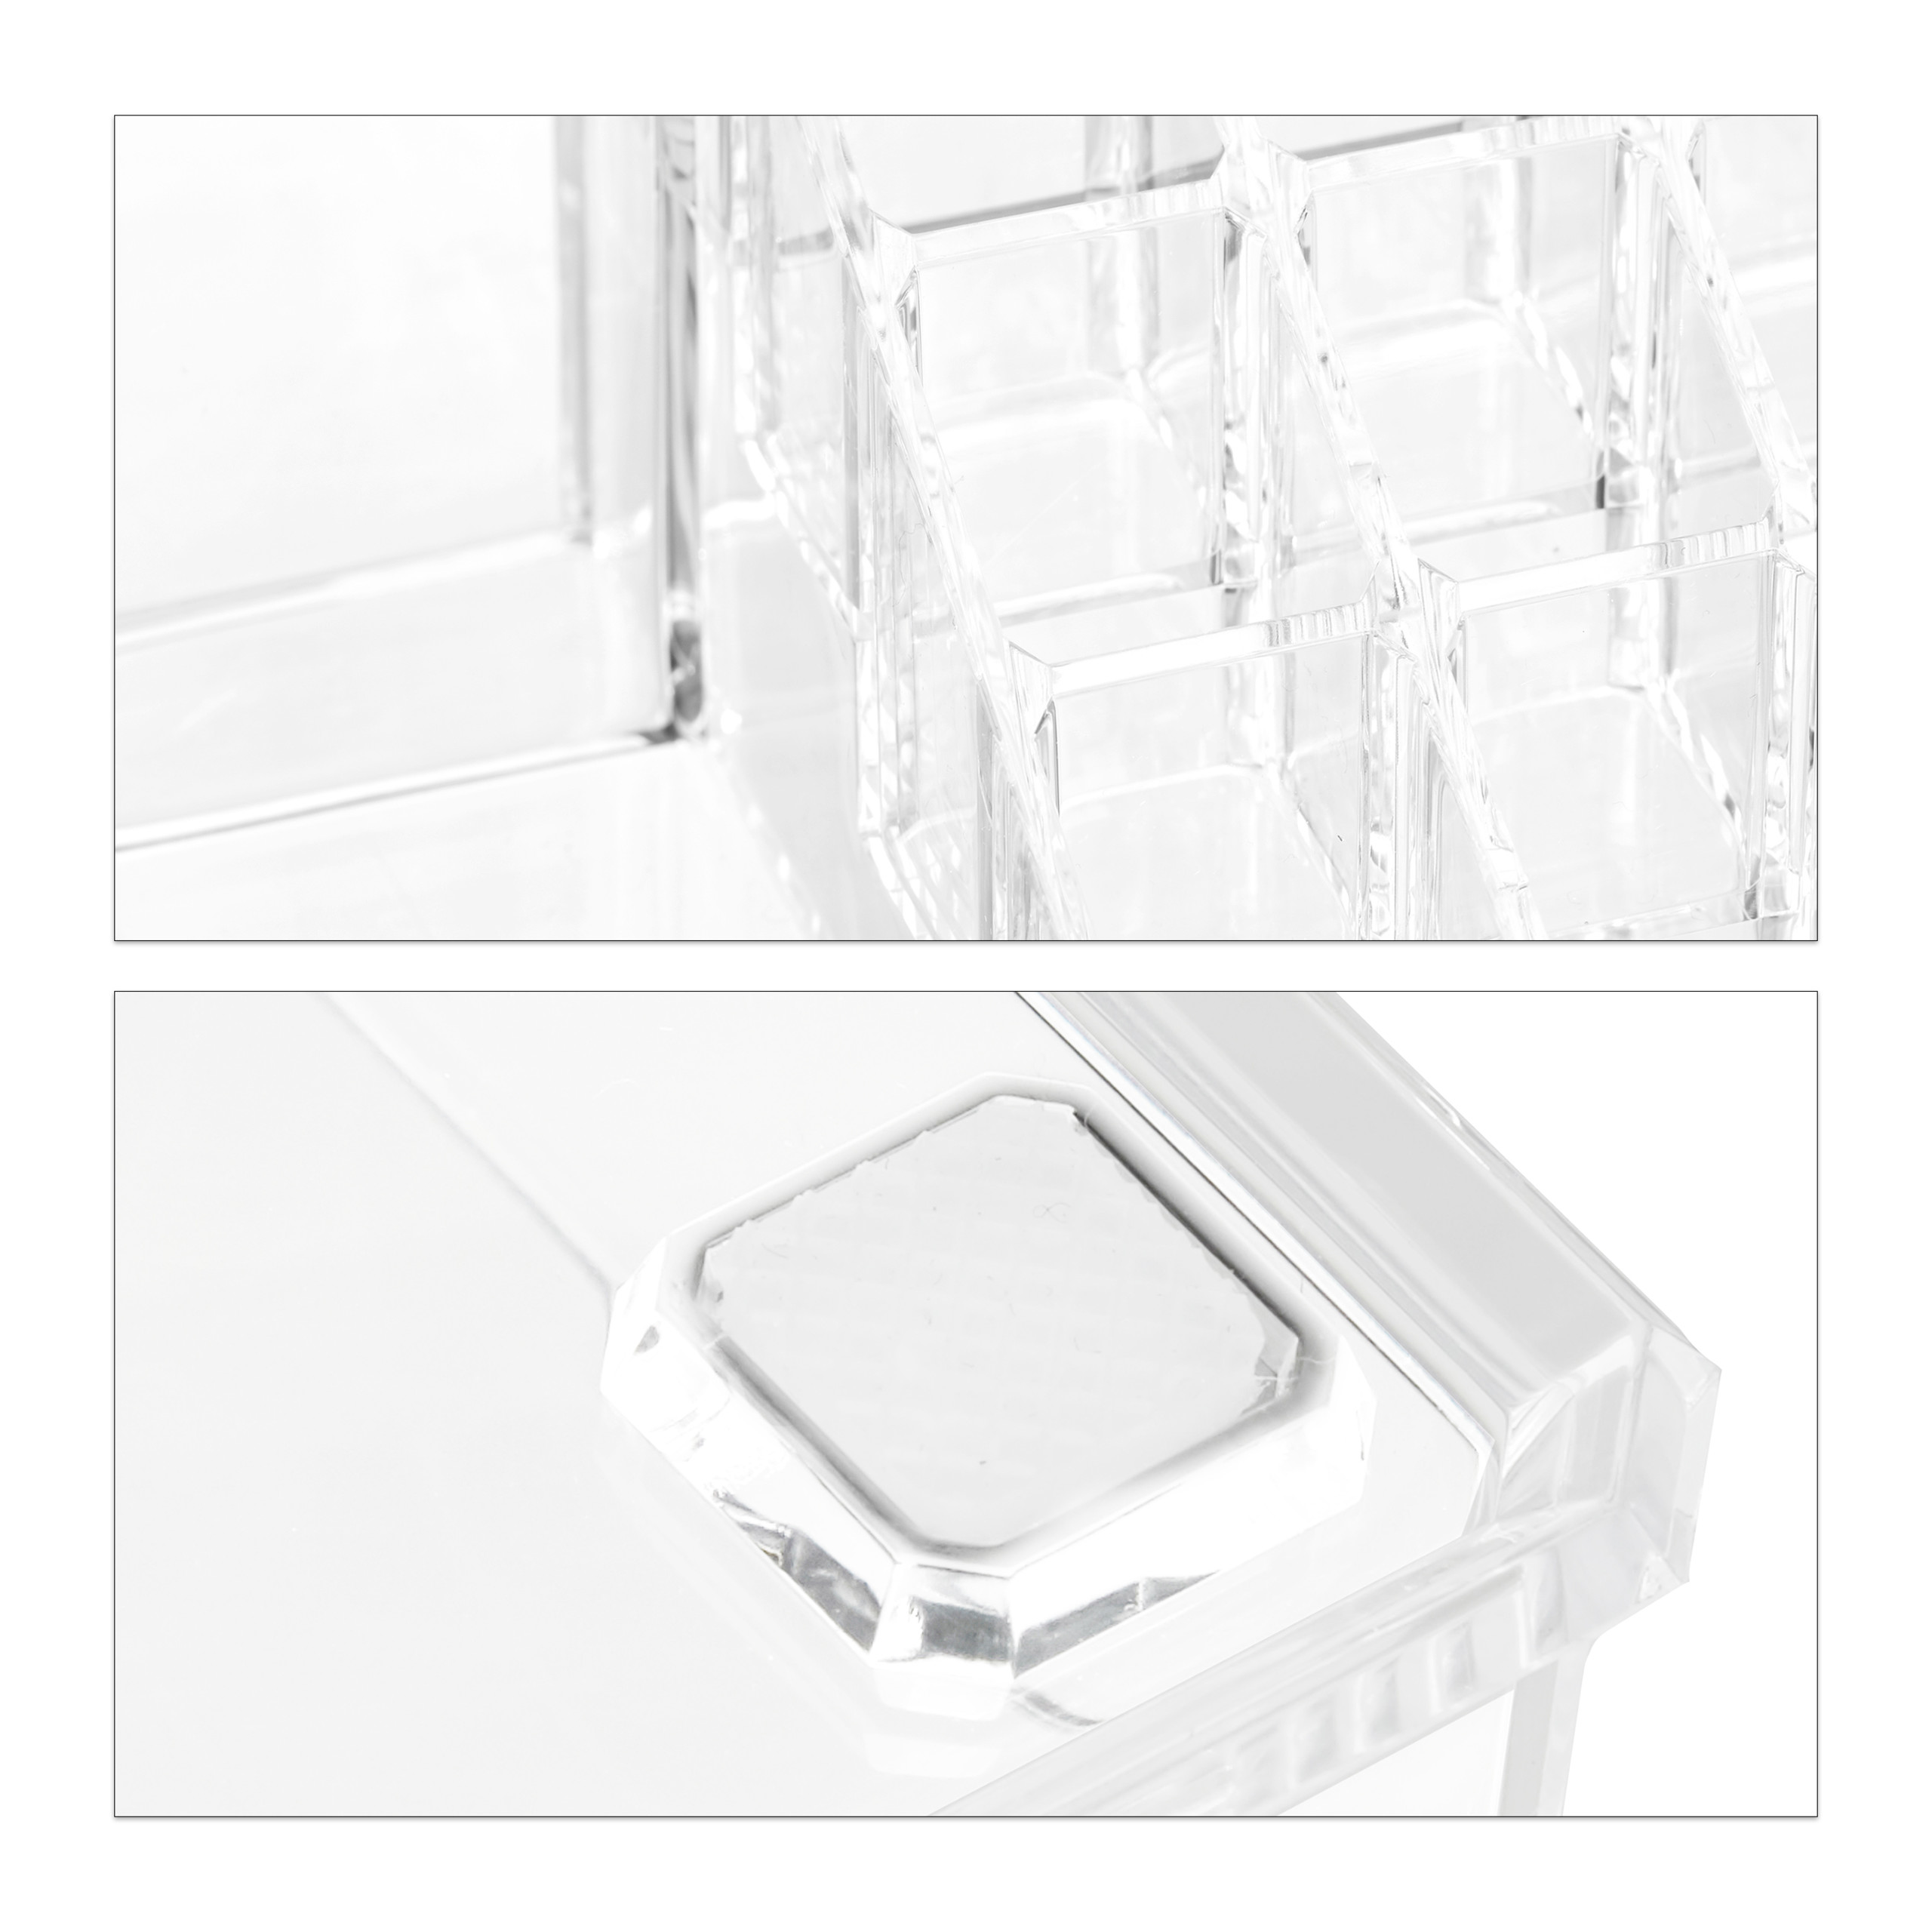 make-up-organizer-opbergen-van-cosmetica-acryl-stapelbaar-met-lades miniatuur 10